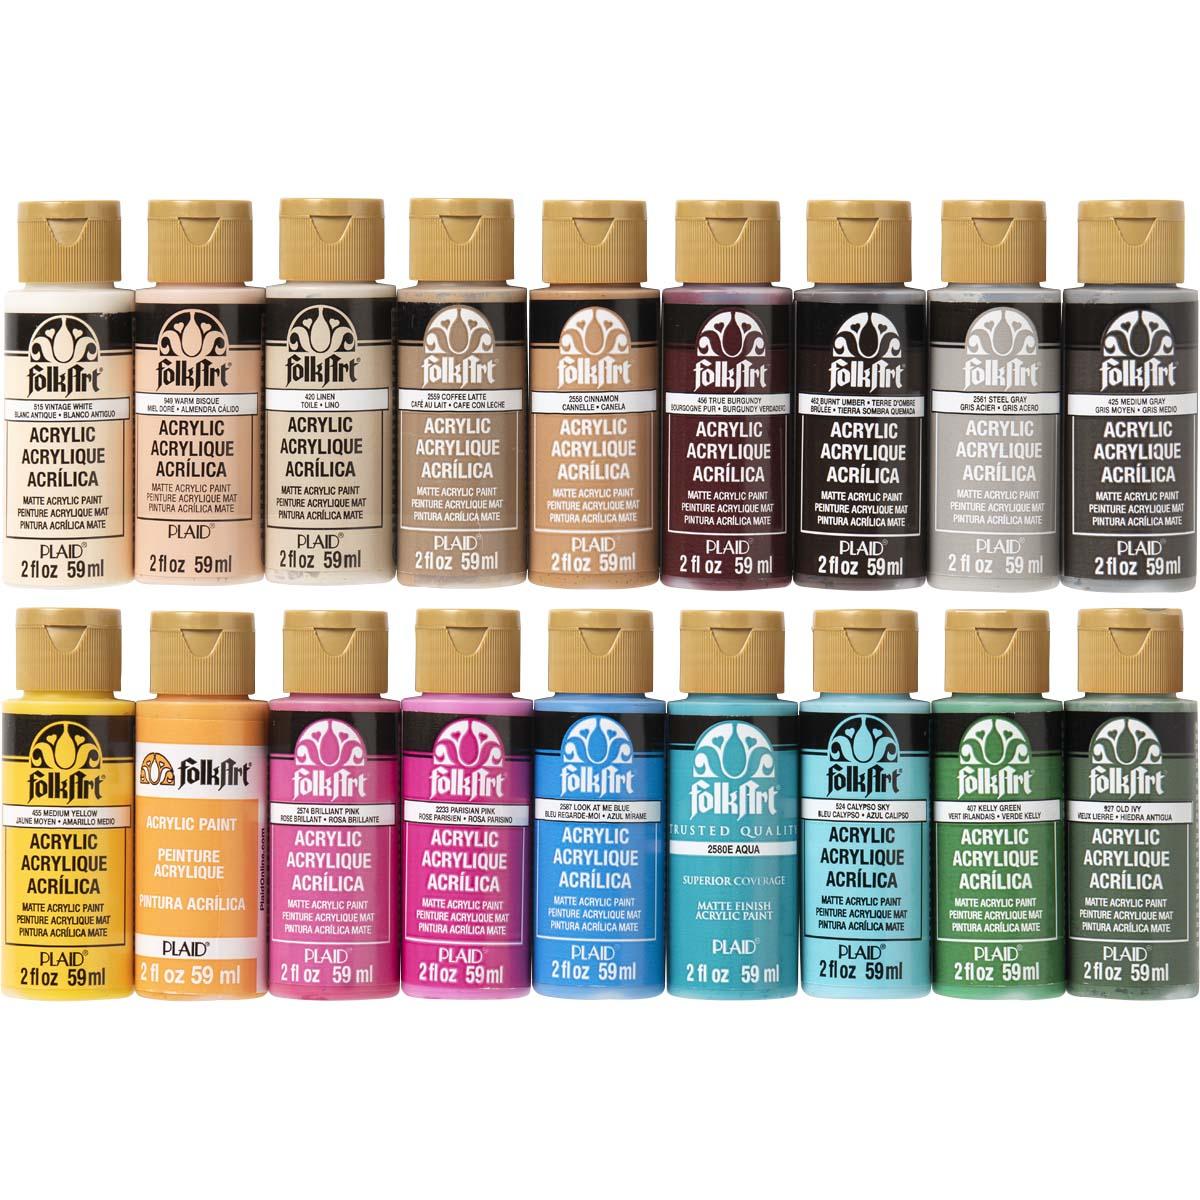 FolkArt ® Acrylic Colors Best Sellers 18 pc, Set 2 - PROMOFAII